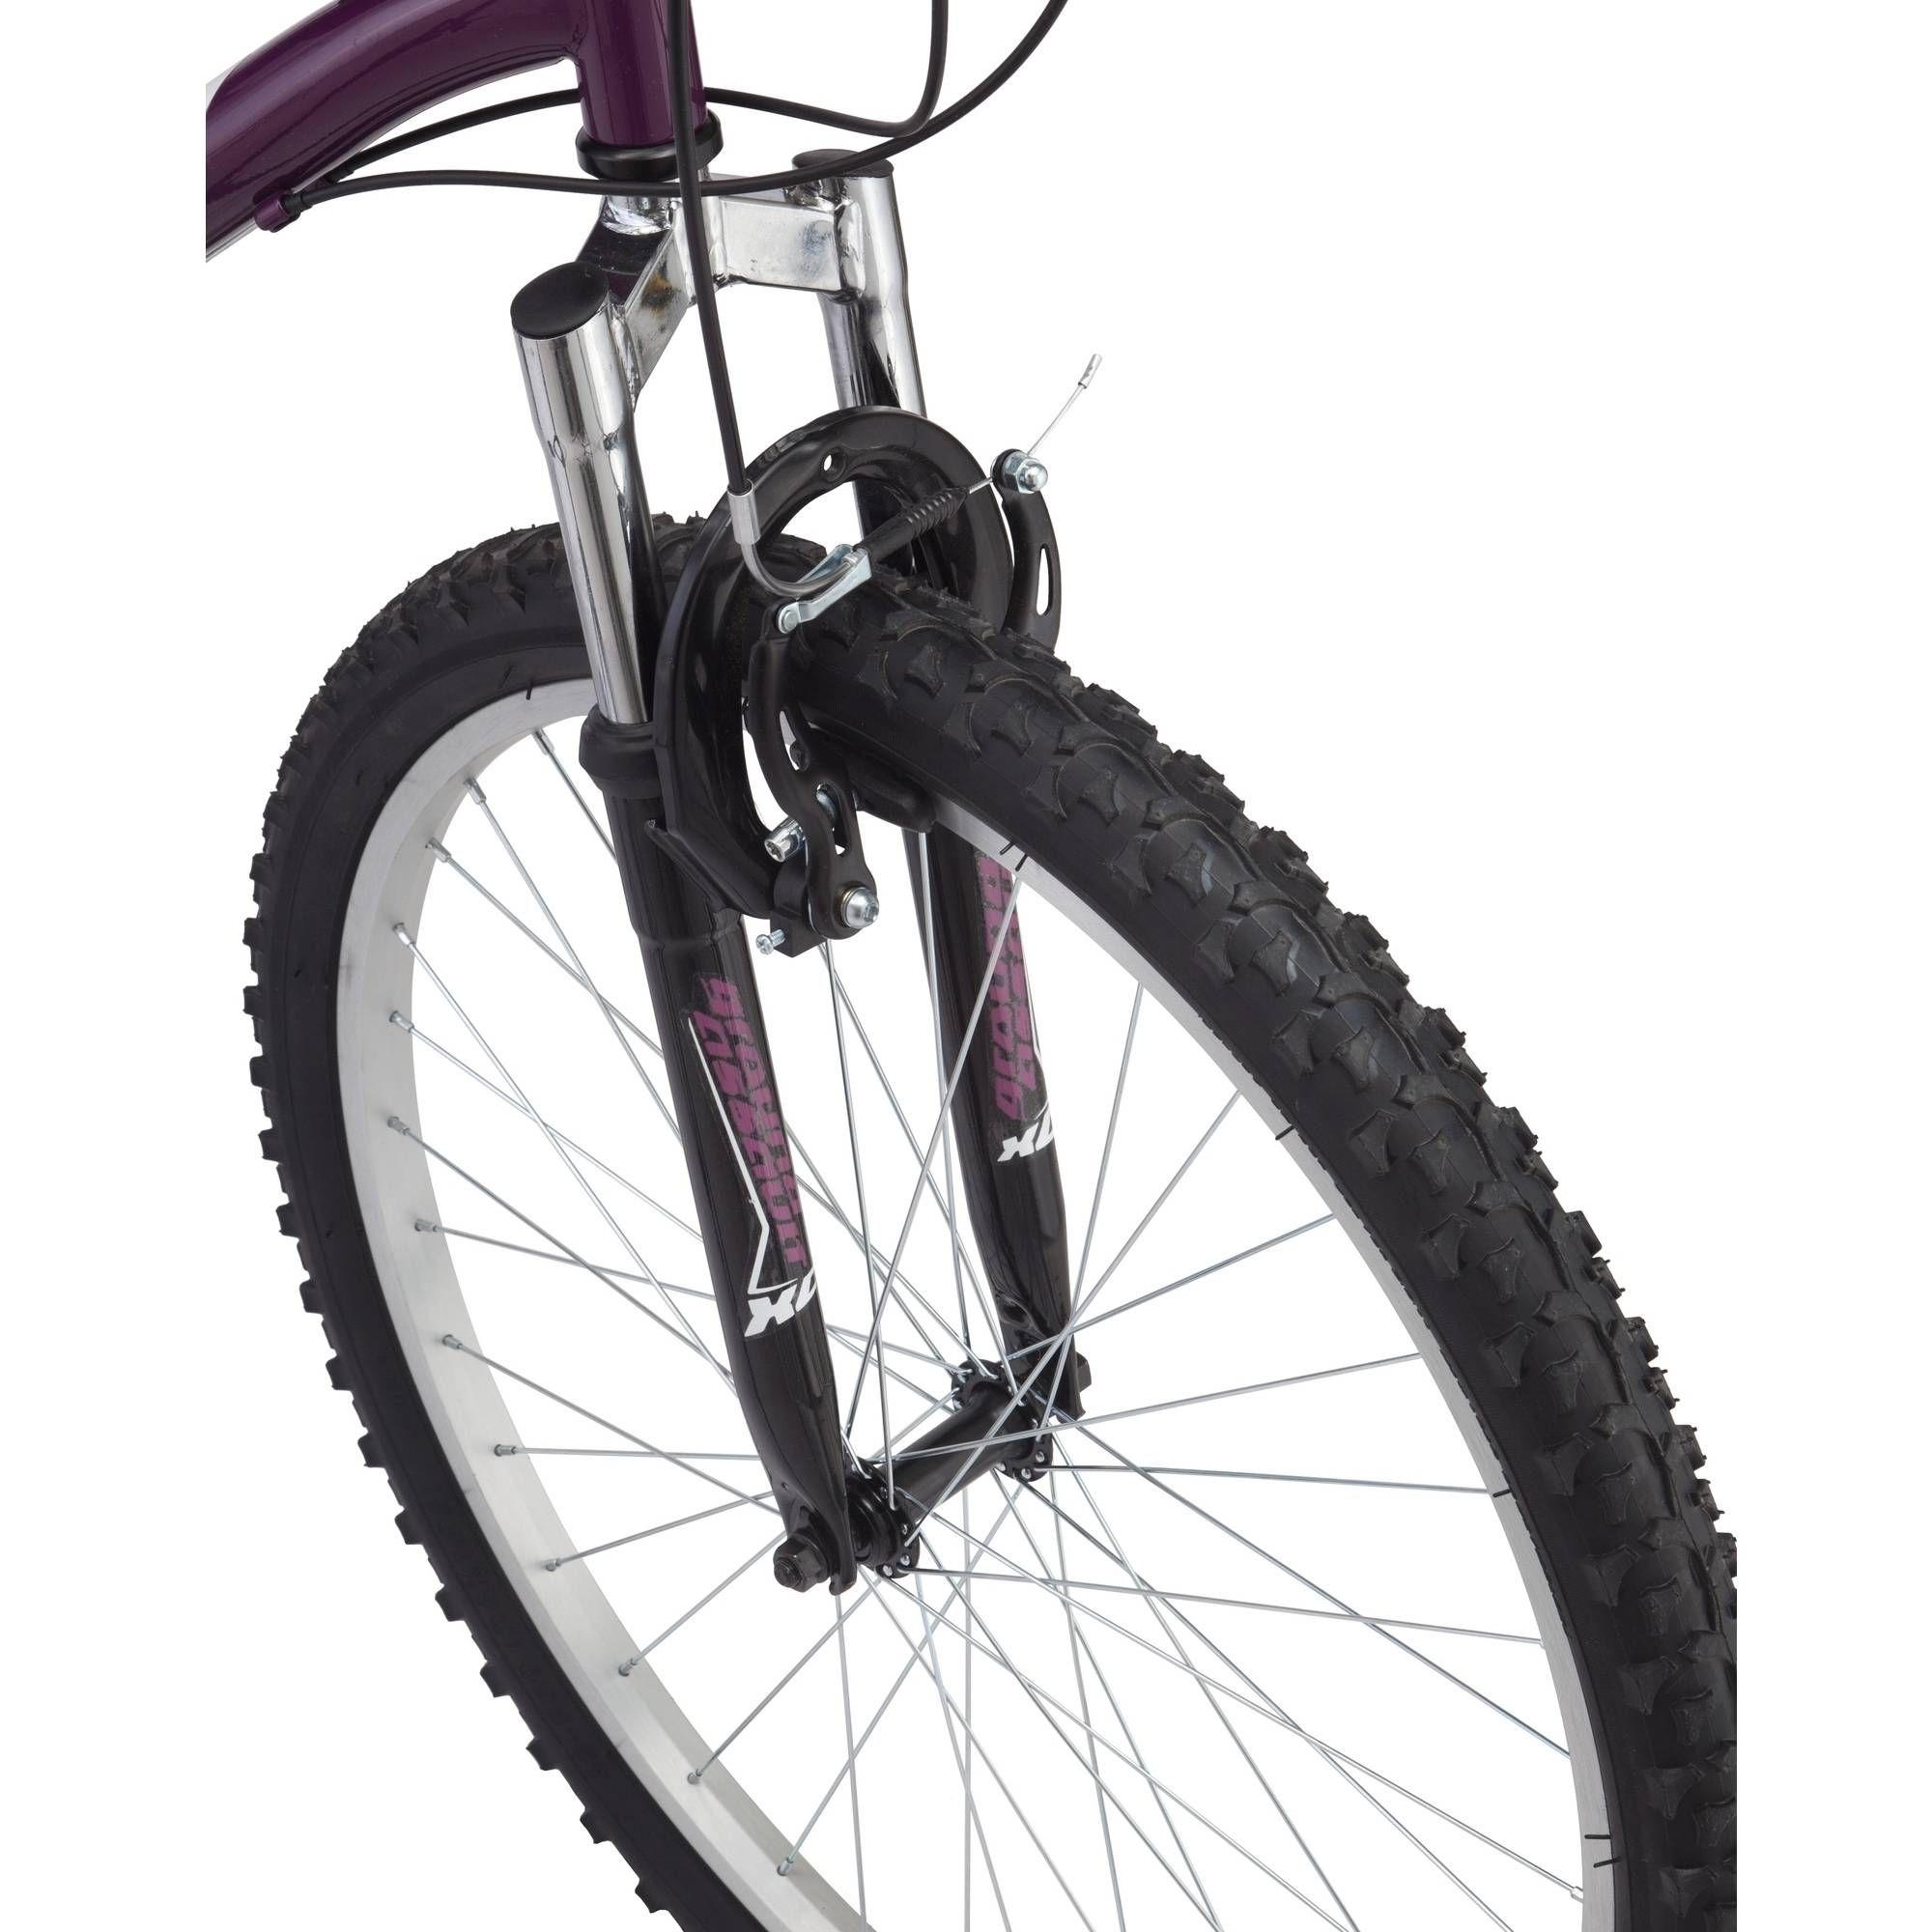 Roadmaster Granite Peak Women S Mountain Bike 26 Wheels Purple Walmart Com Recreational Bikes Bike Mountain Biking